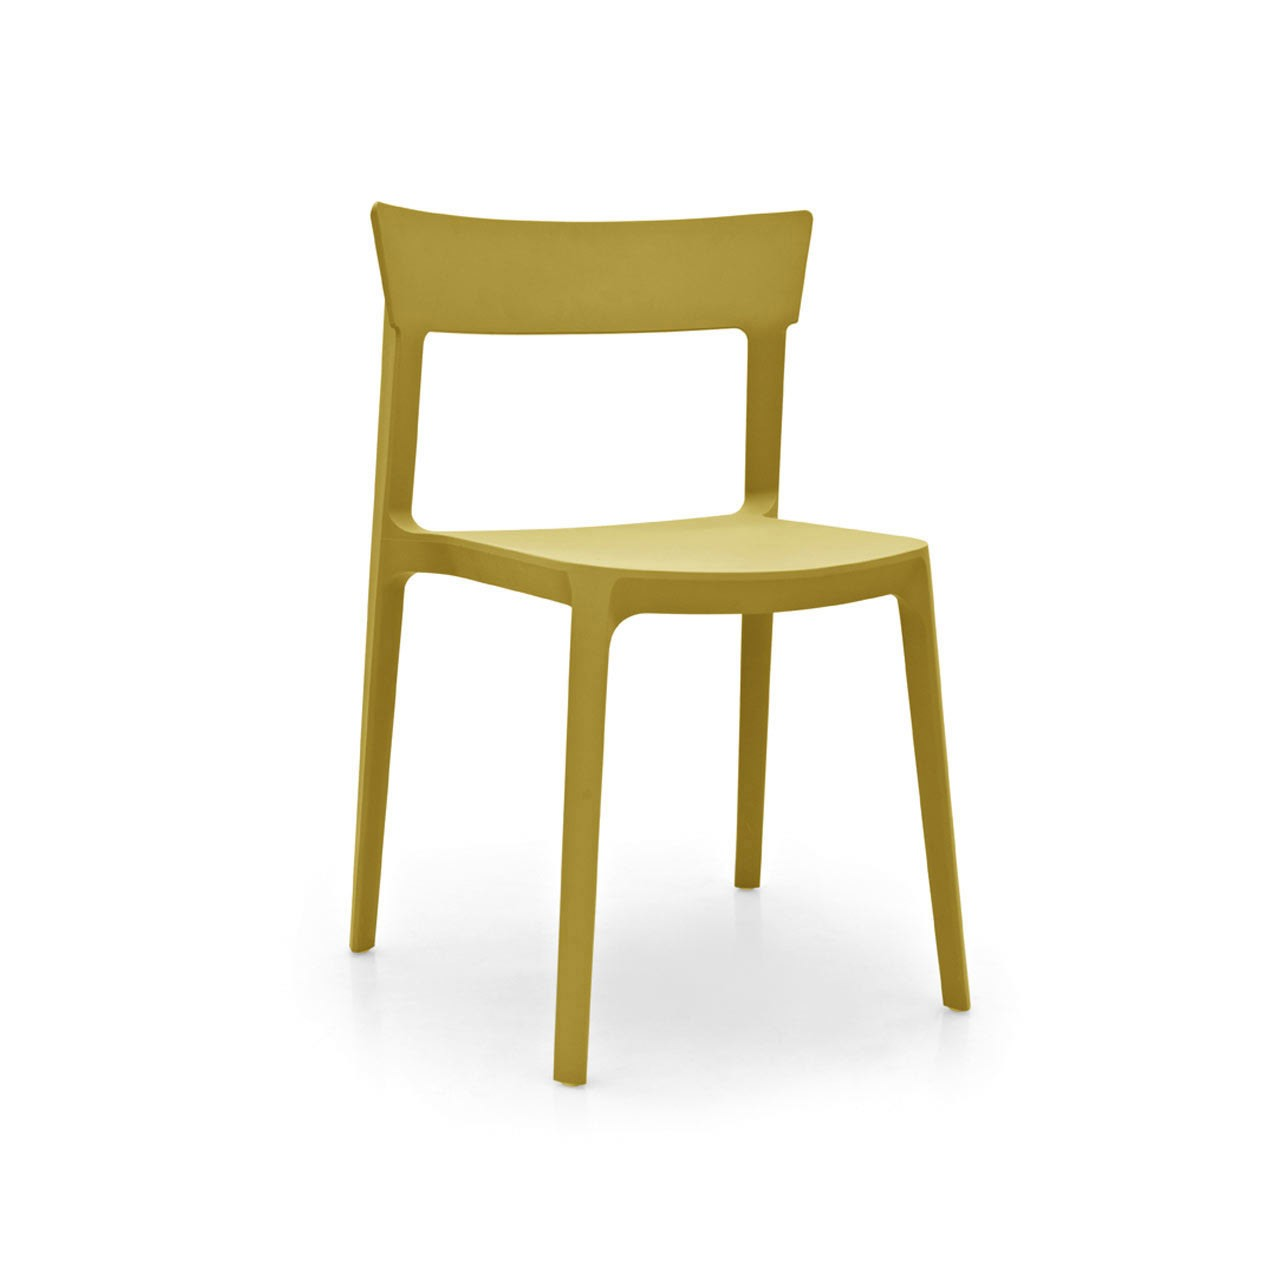 Skin sedia sedie e sgabelli torino calligaris arredamenti traiano - Sedia skin calligaris ...